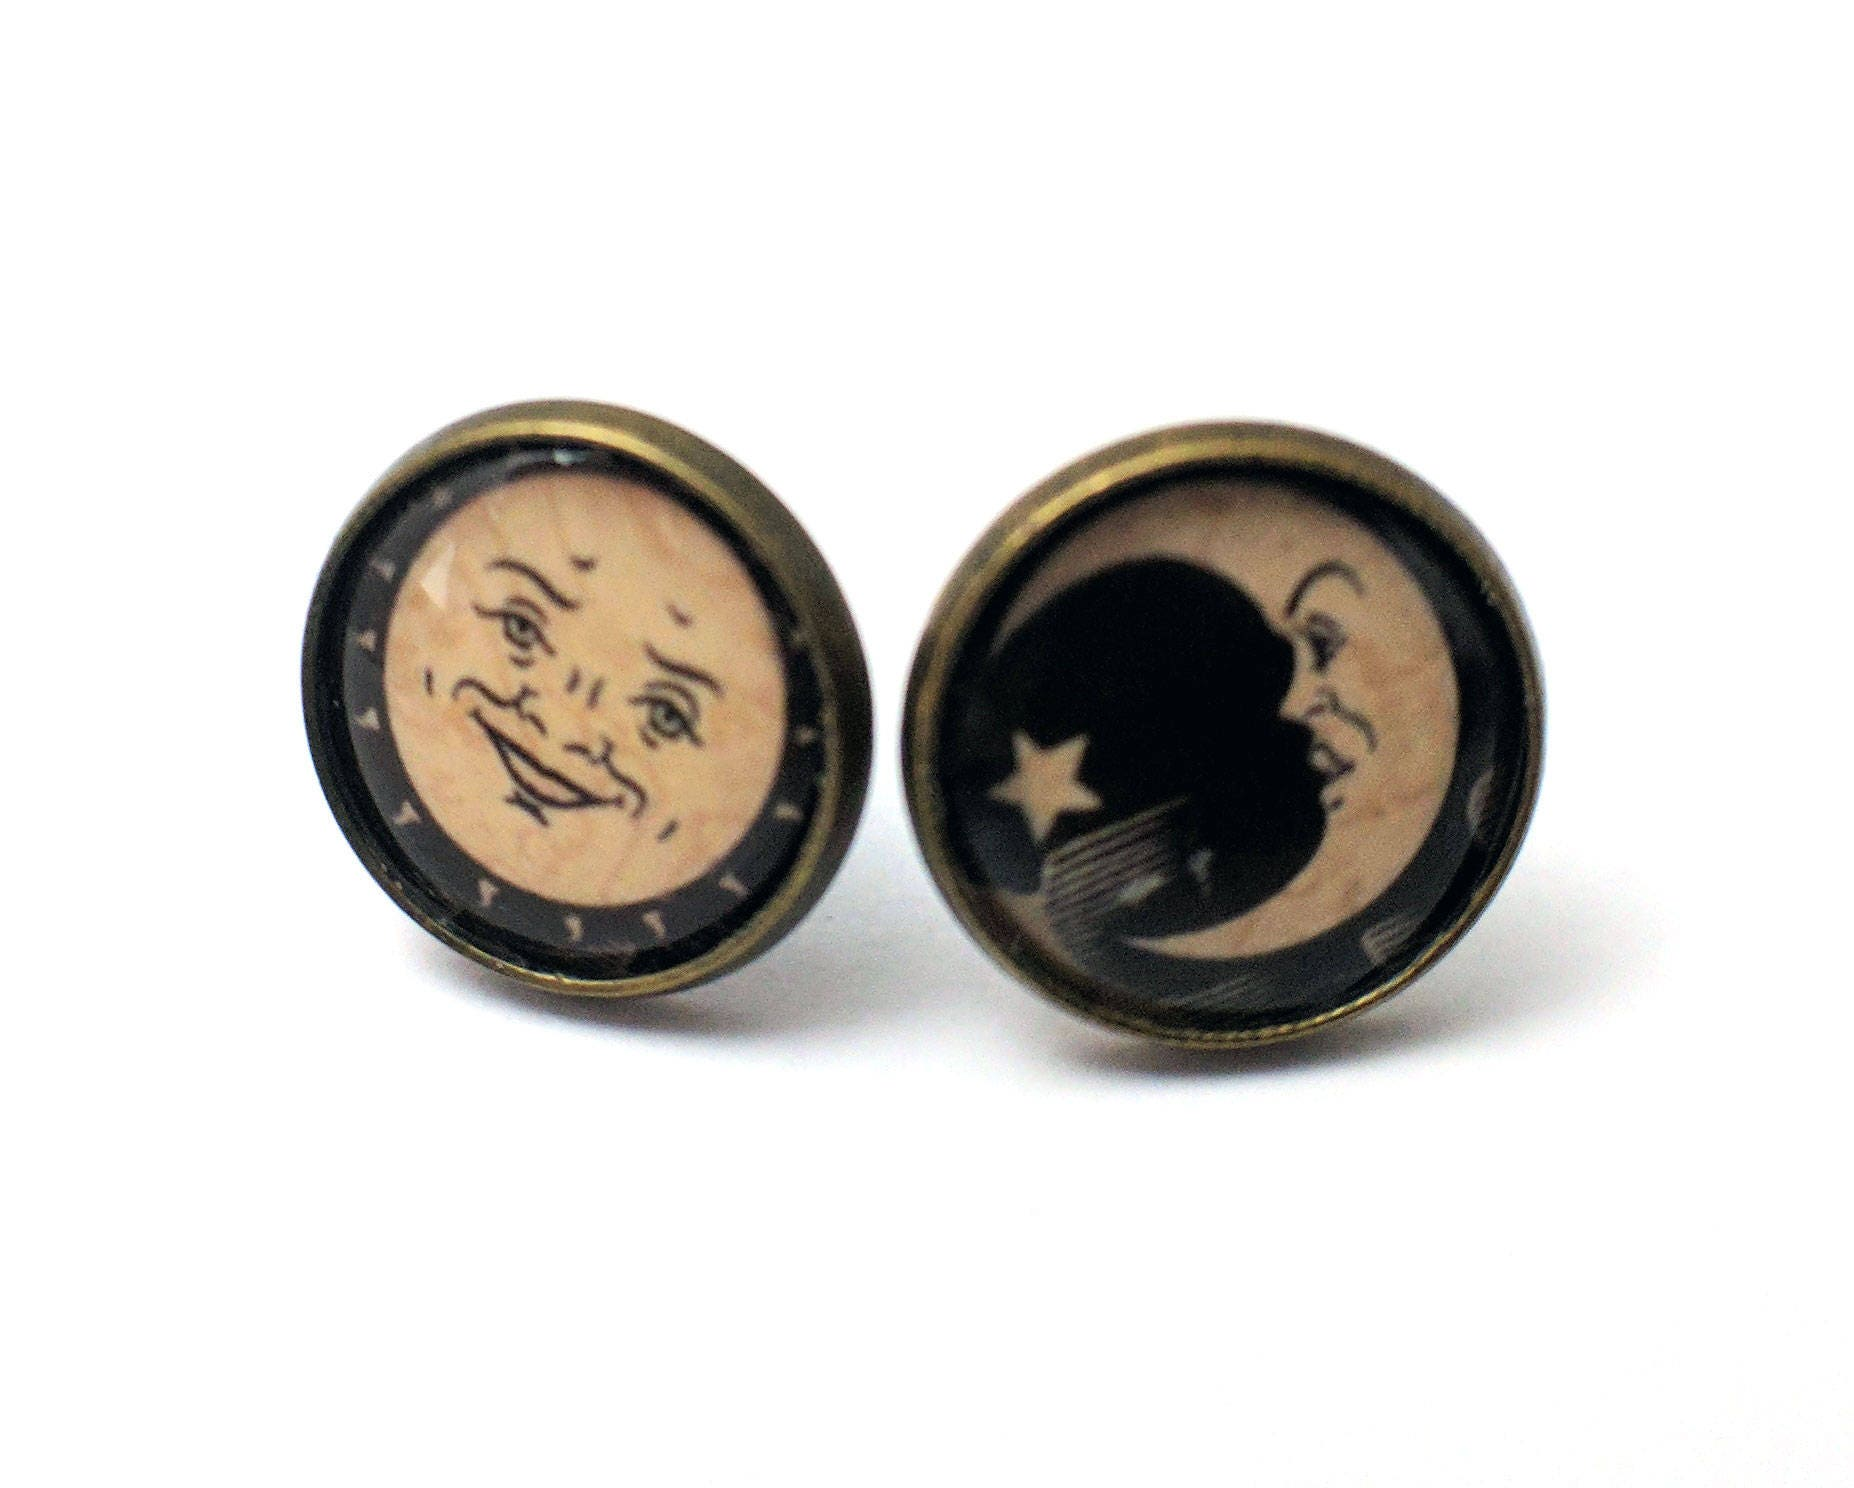 Sunmoon ouija board symbols 12mm bronze stud earrings buycottarizona Gallery